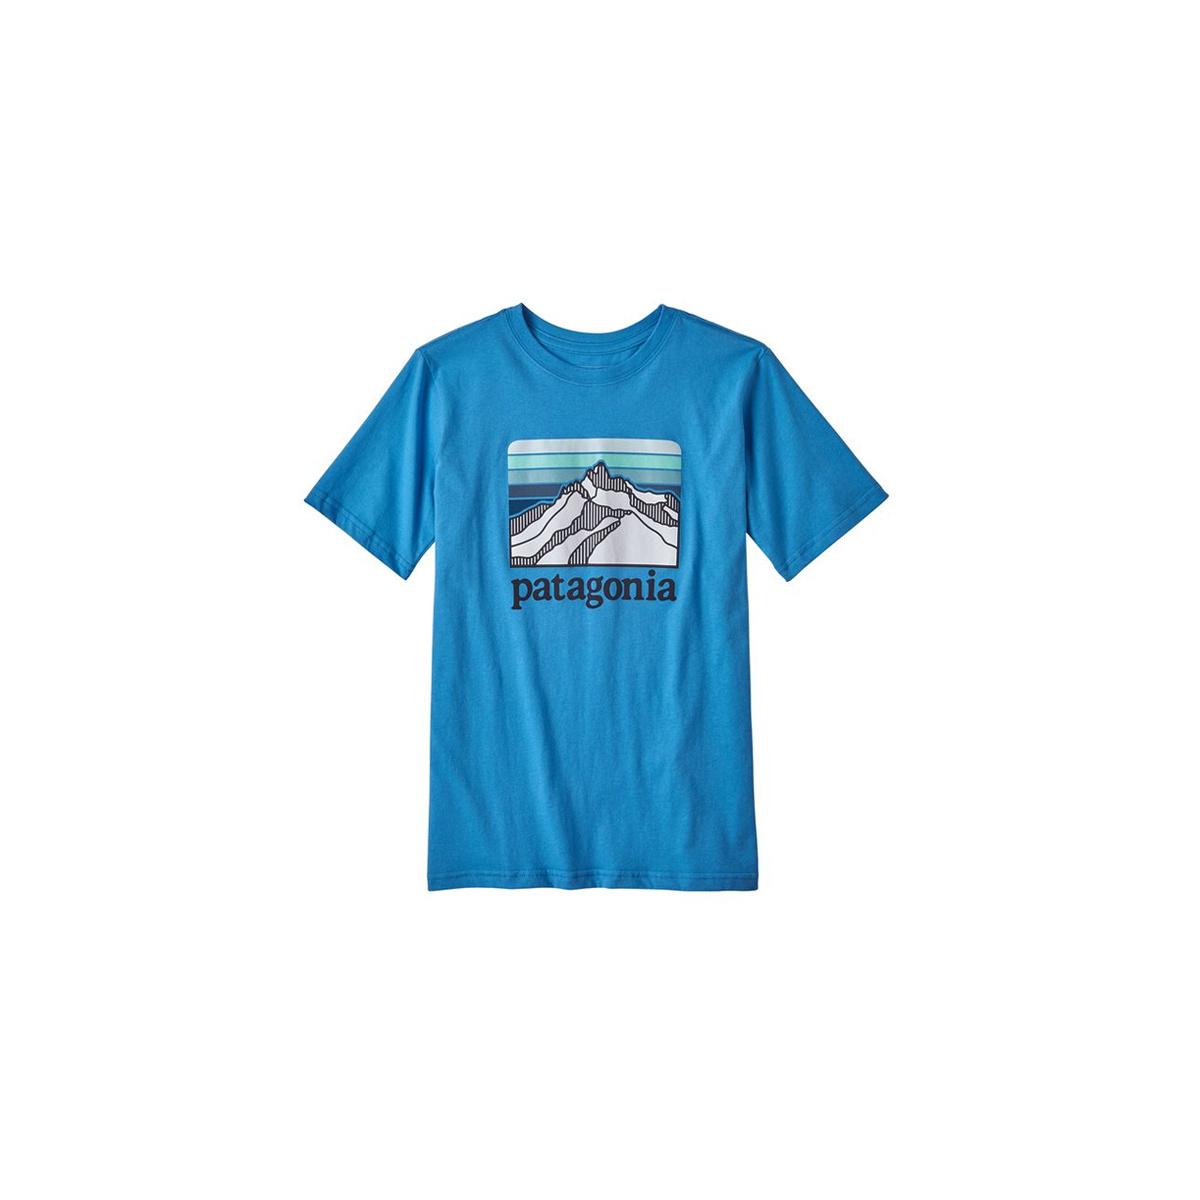 Patagonia Boy's Graphic Organic T-Shirt